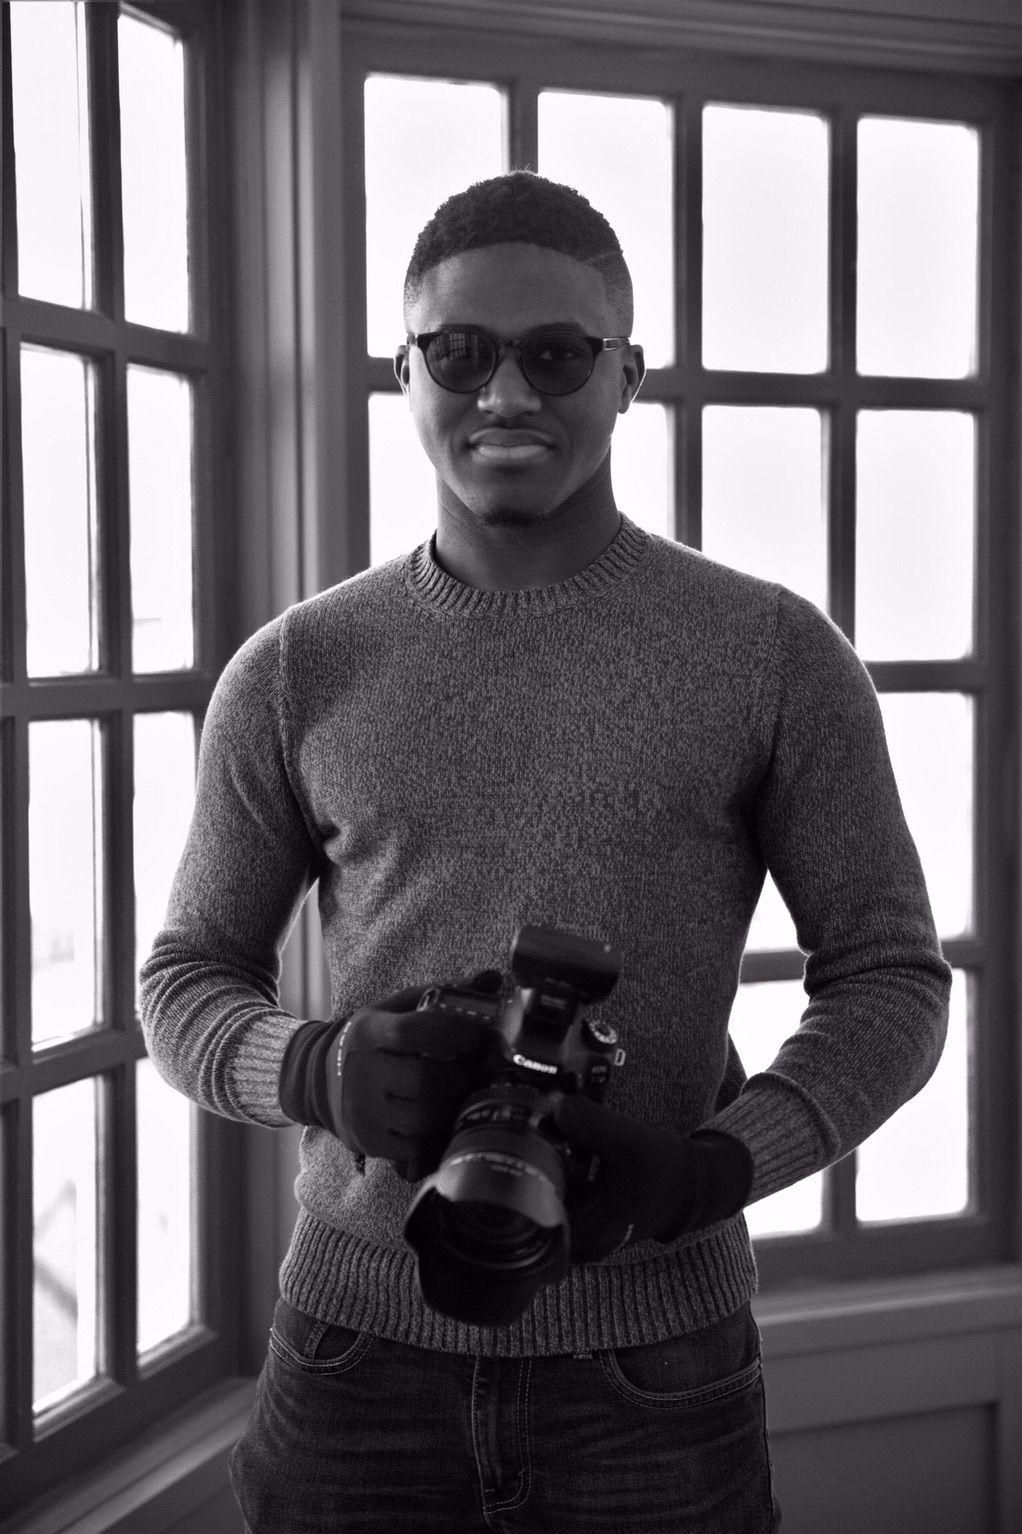 J. Quentin Photo